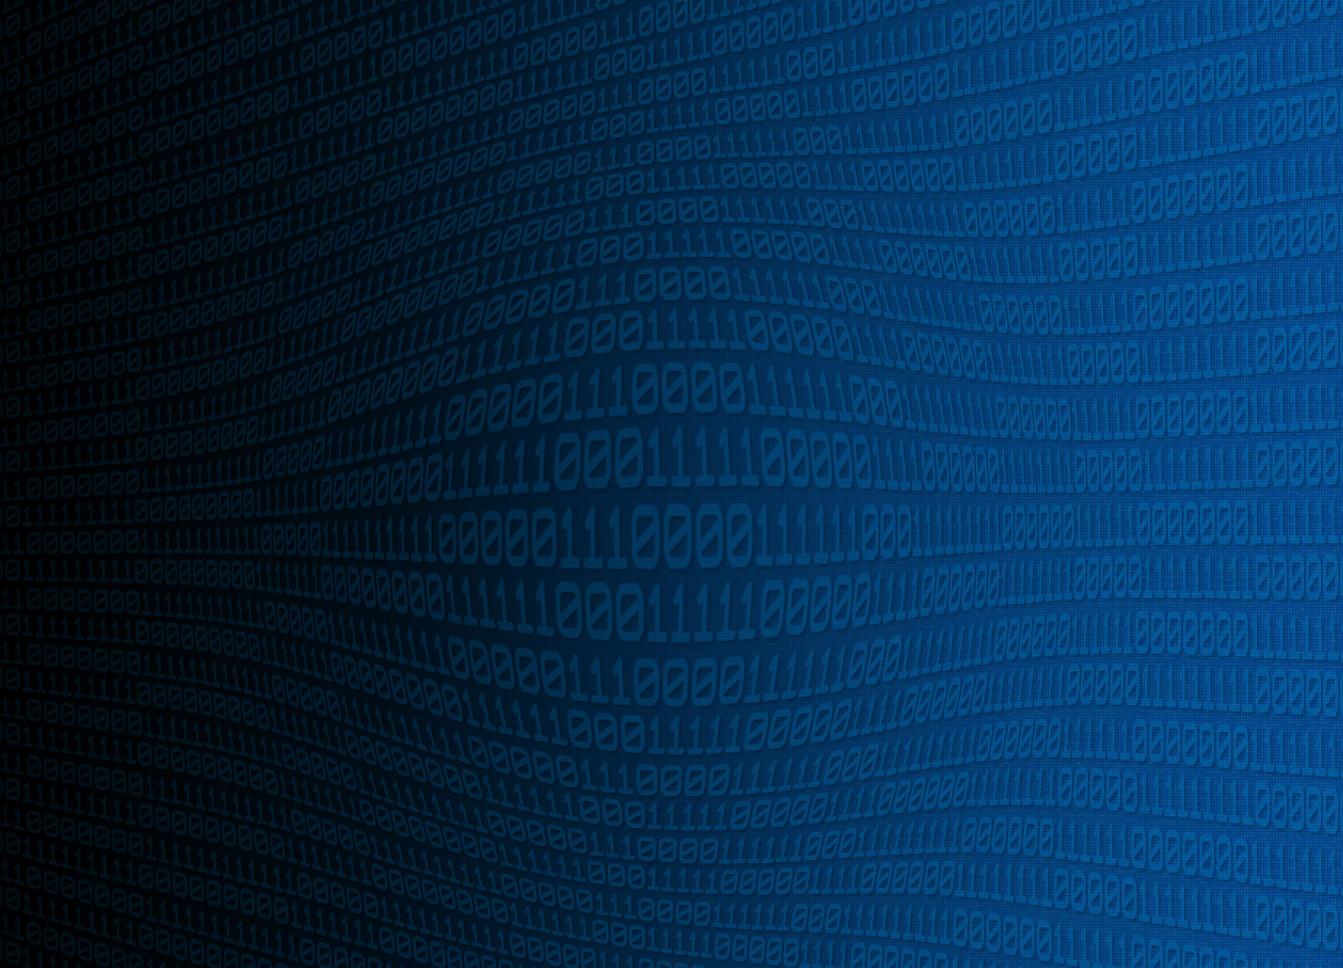 Data Driven Enterprise: Data Lake & Data Warehouse Solutions